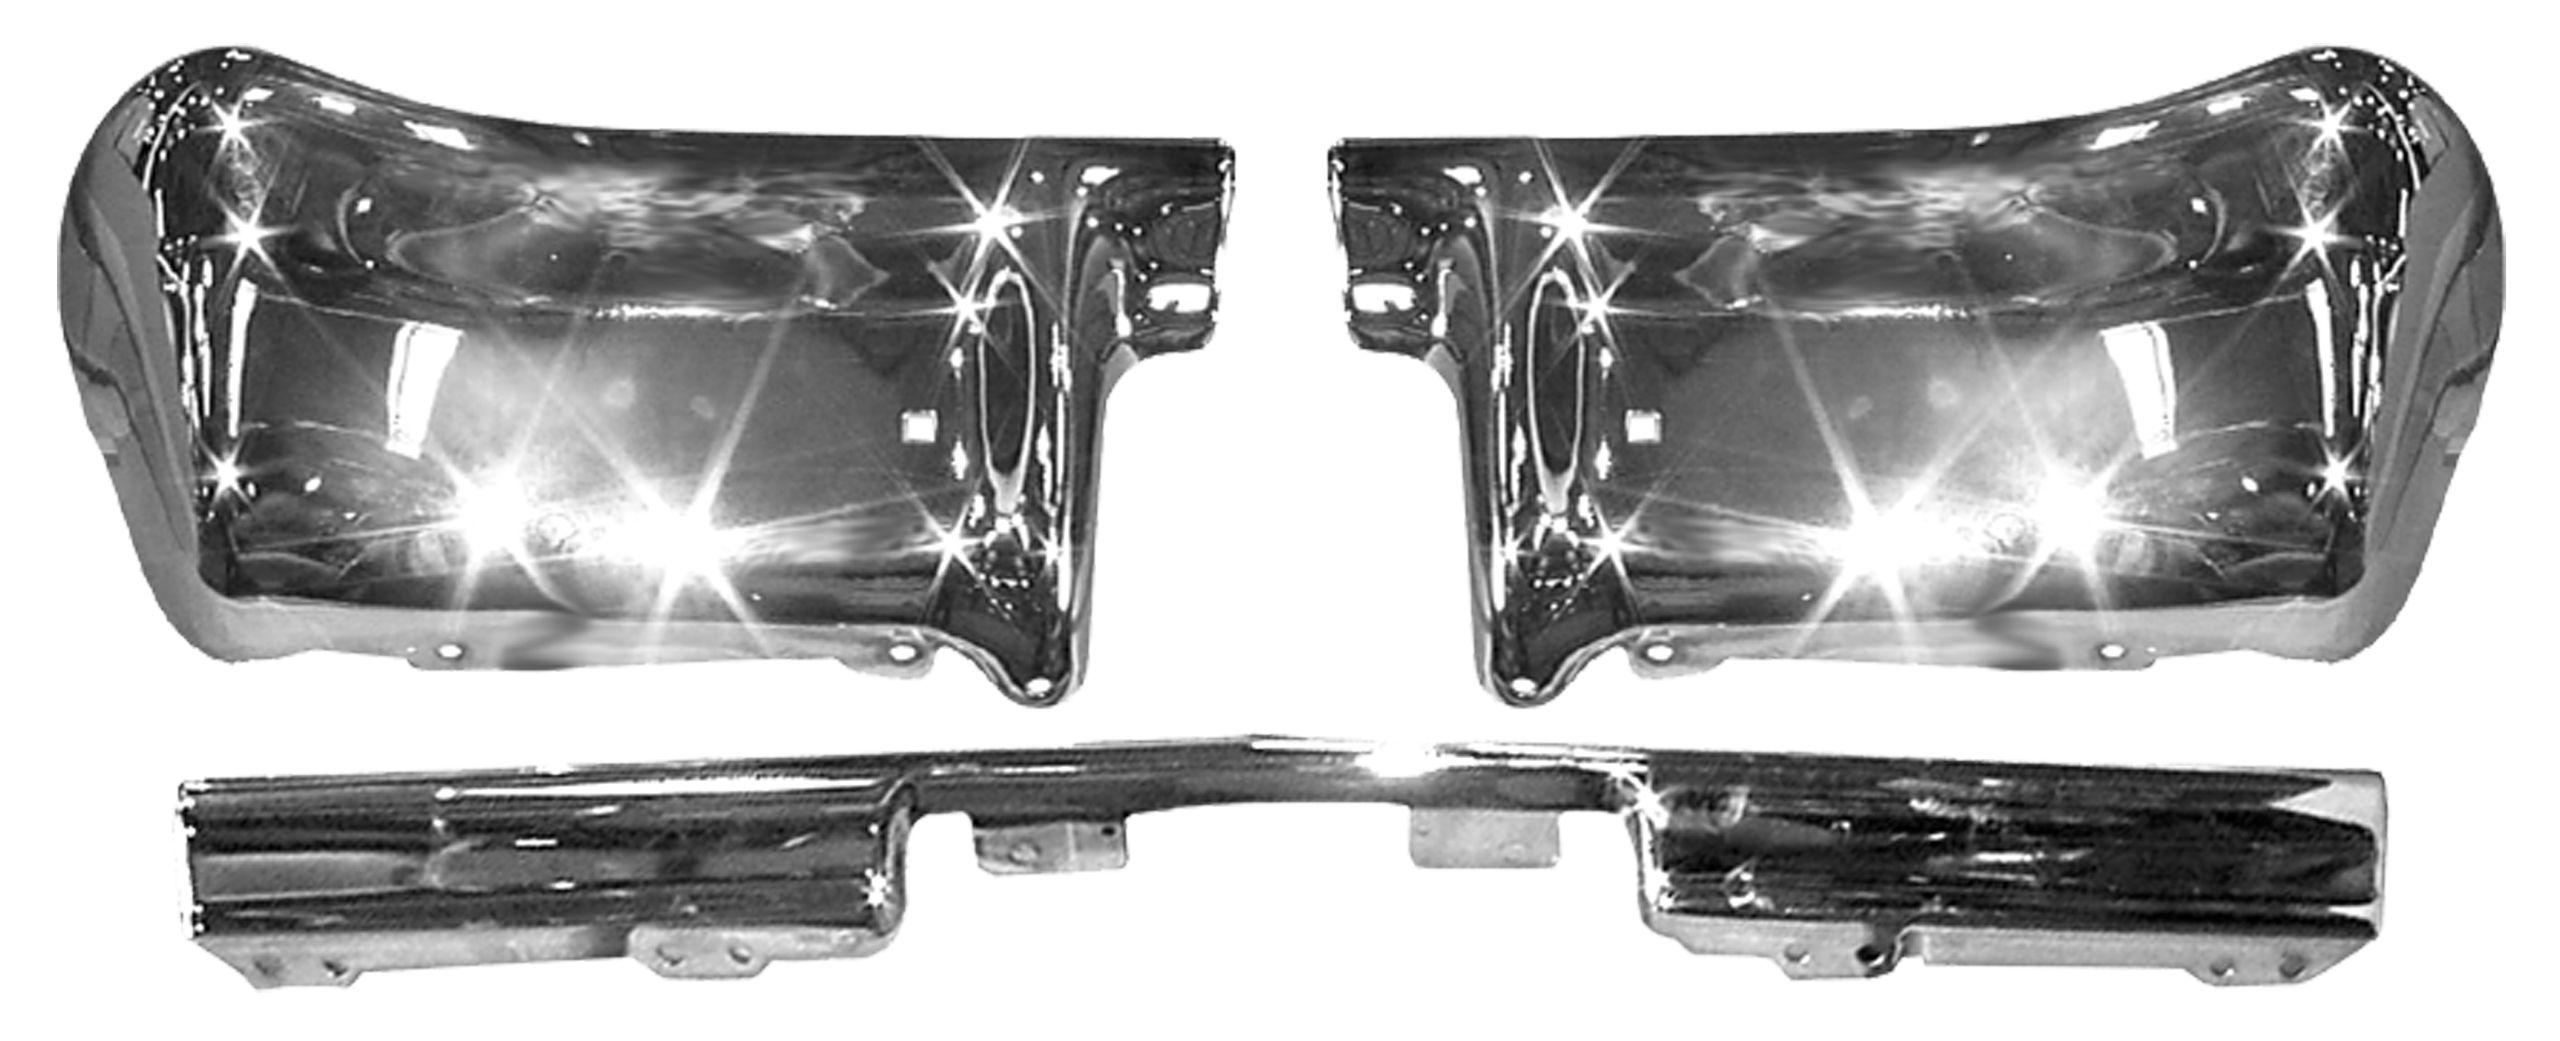 1963 Impala rear bumper 3 pc chrome